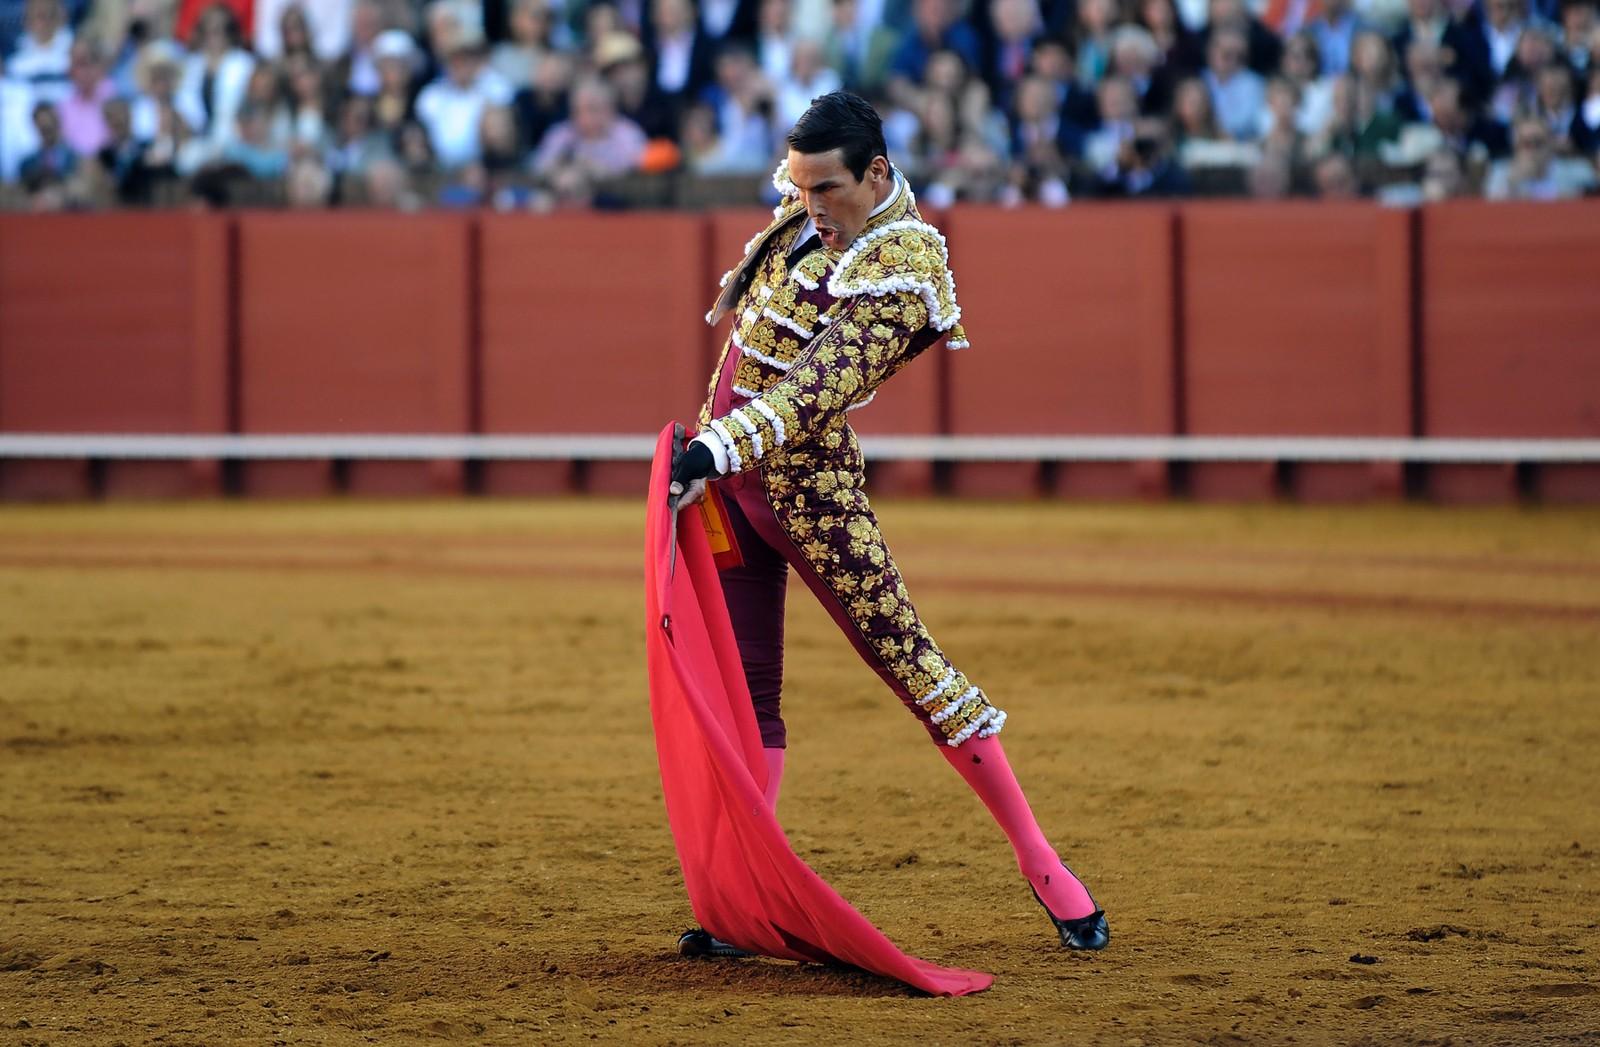 OLÉ: Den spanske matadoren Jose Maria Manzanares erter opp oksen under tyrefekting i Sevilla i Spania torsdag denne uken.